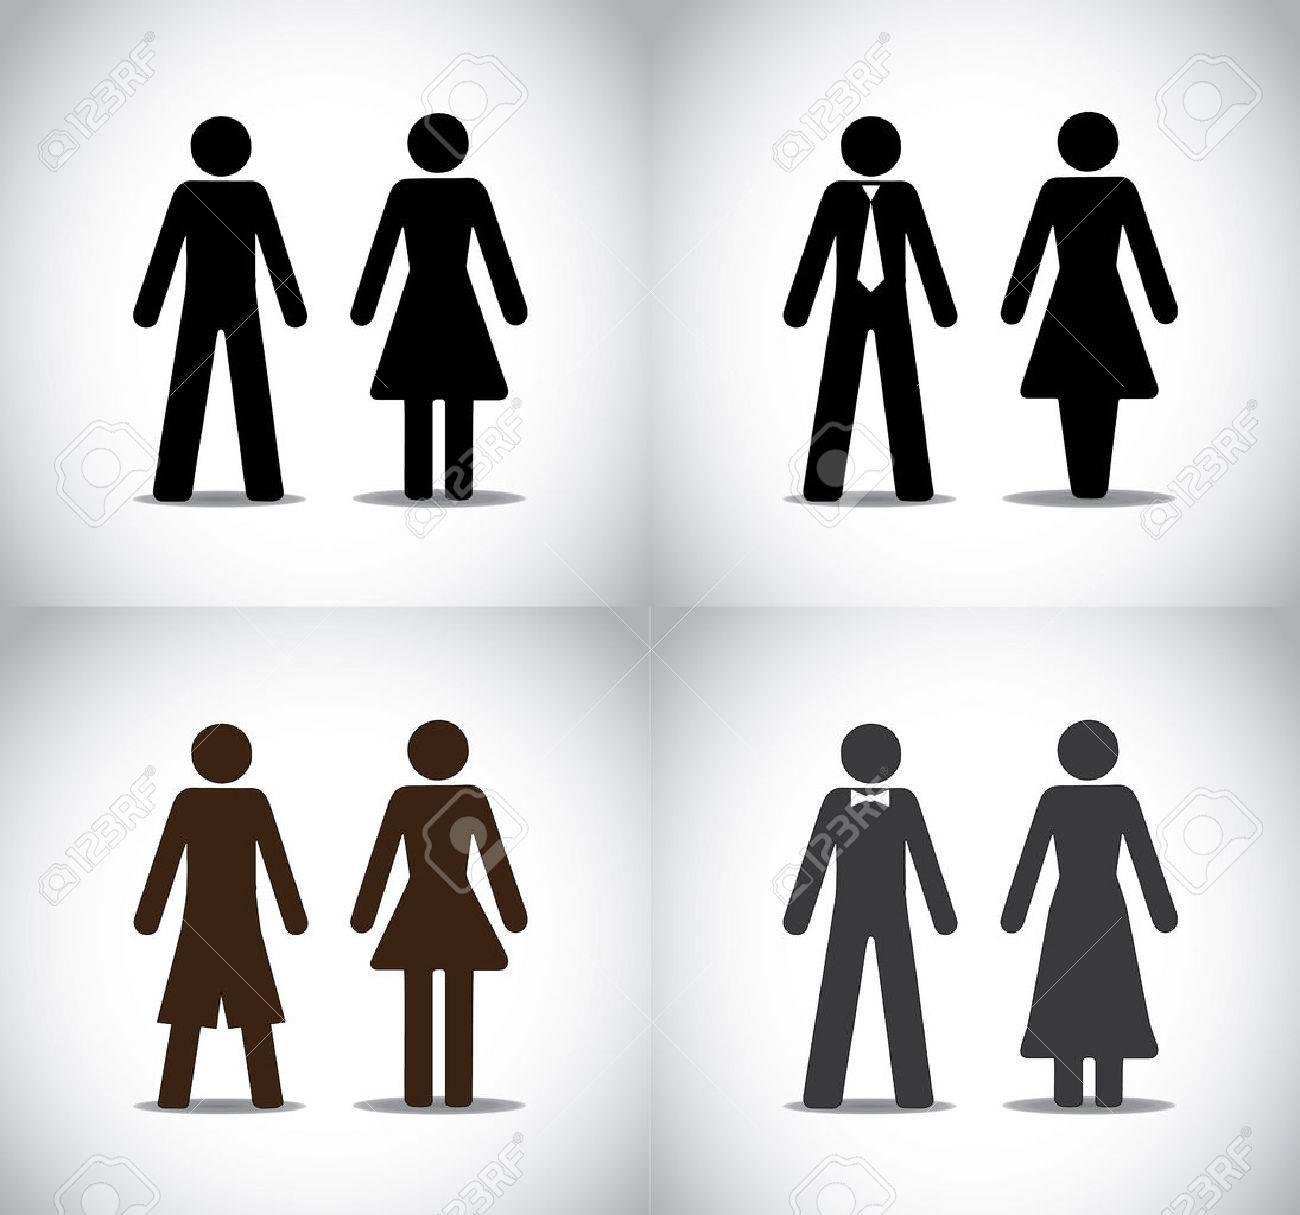 Bathroom Sign Man And Woman symbols girl | carpetcleaningvirginia